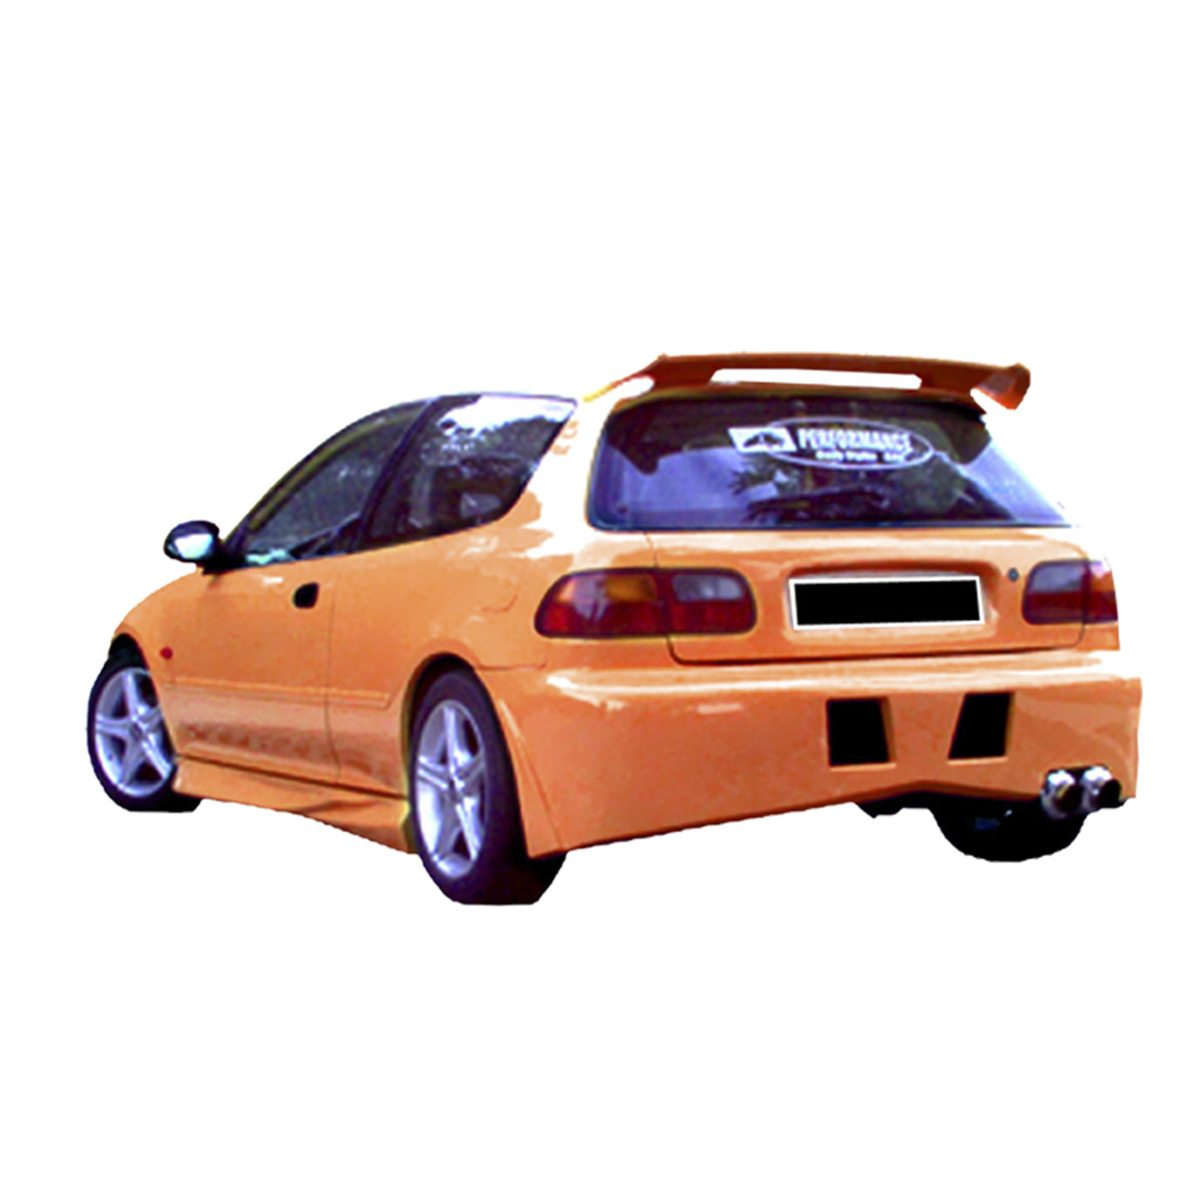 Honda-Civic-92-Shade-tras-PCR021